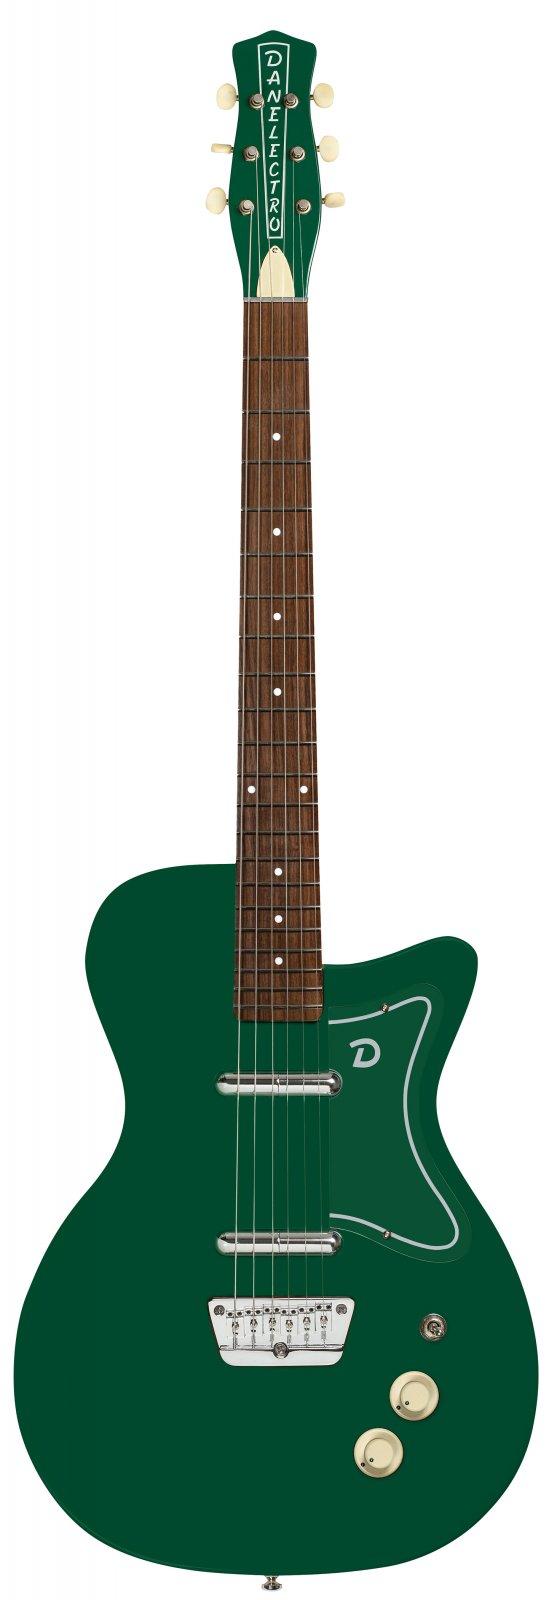 Danelectro '57 Jade Semi-Hollow Electric Guitar